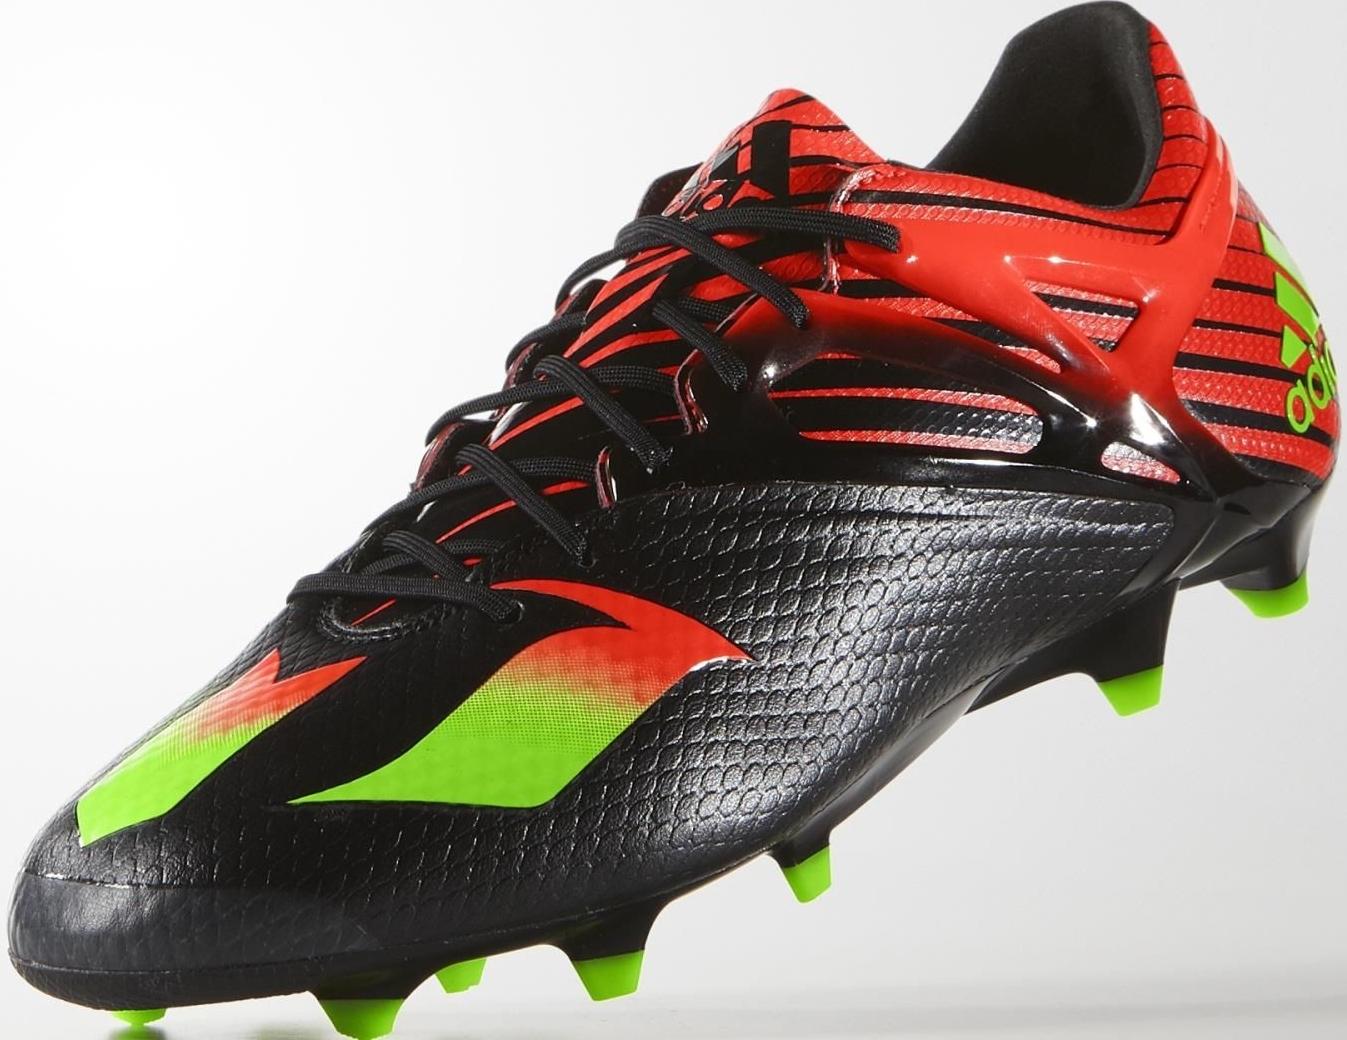 CHUTEIRAS DE OURO  Adidas Messi 15.1 receberá as cores black solar ... faf7f02ff995b